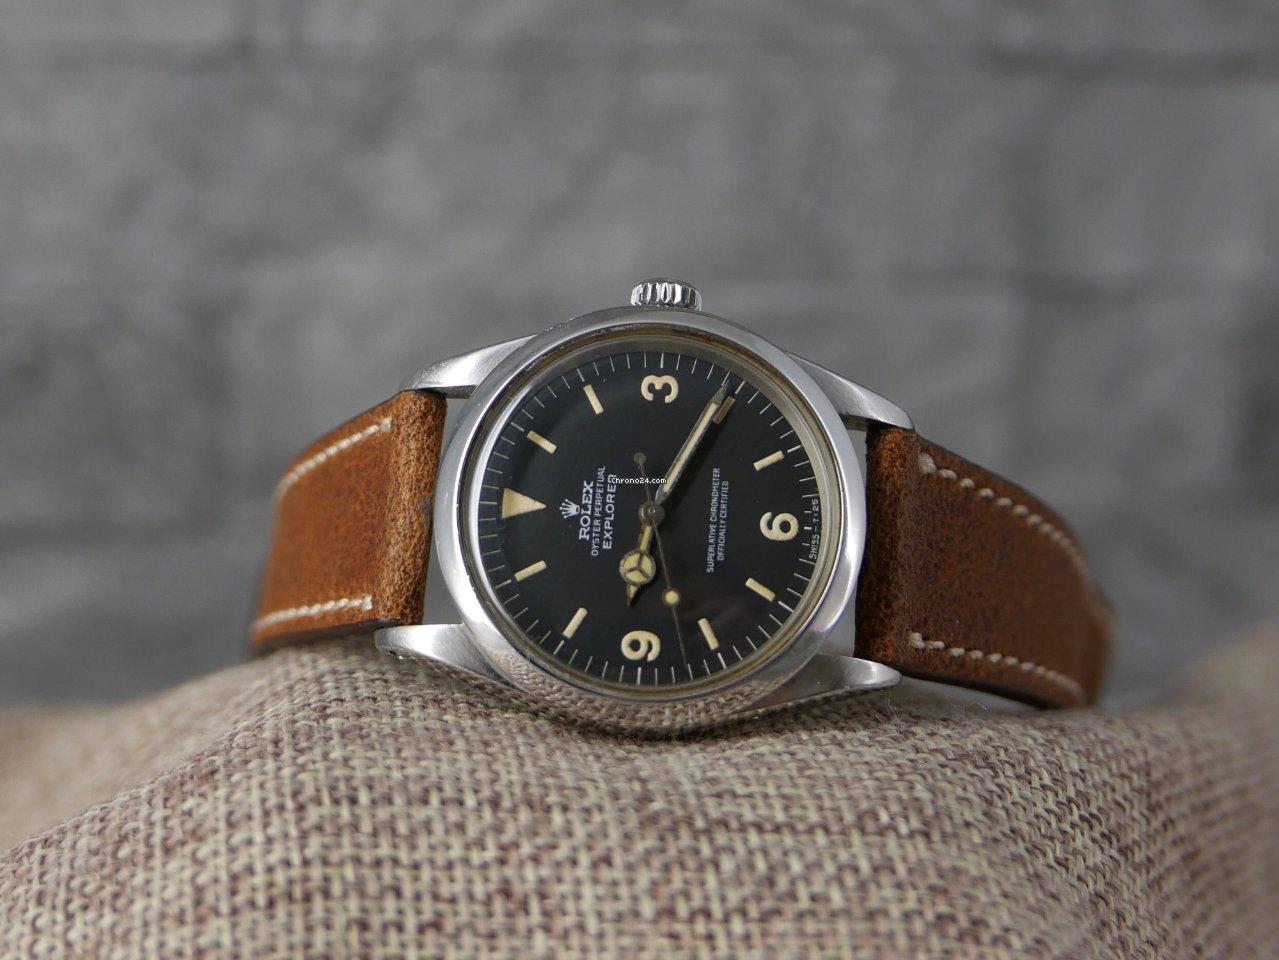 6c7ae5f7eb101 Rolex 1016   Rolex Reference Ref ID 1016 Watch at Chrono24